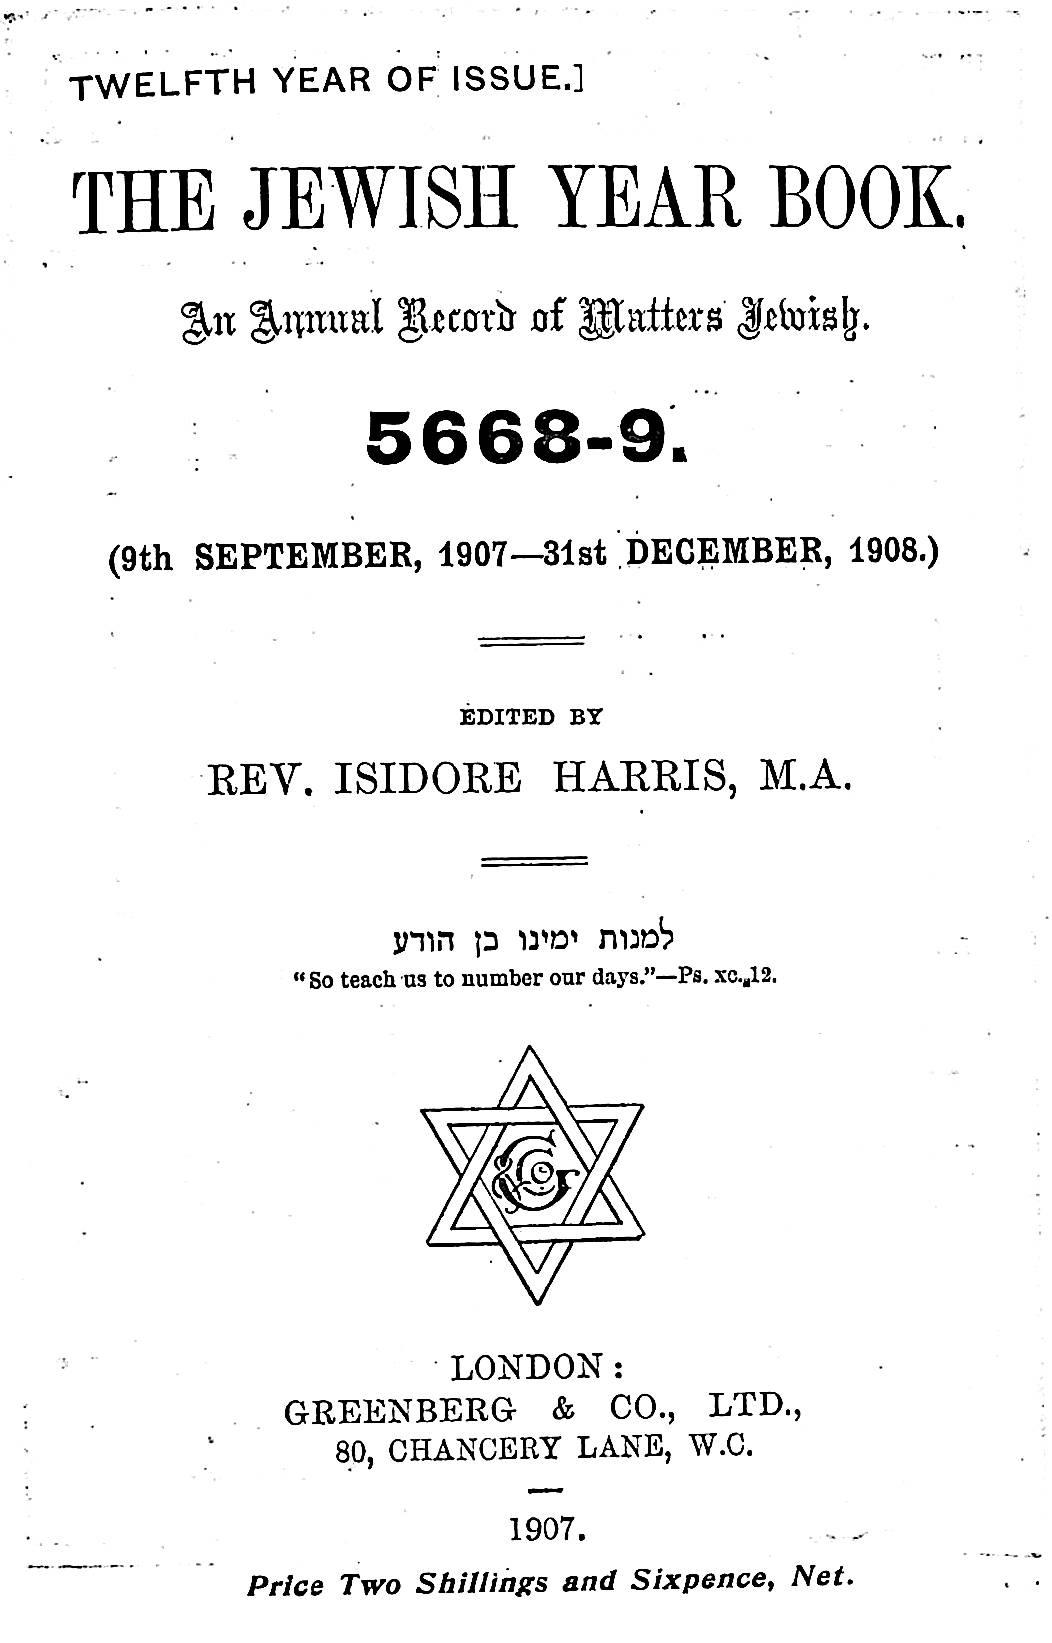 1907JYB01